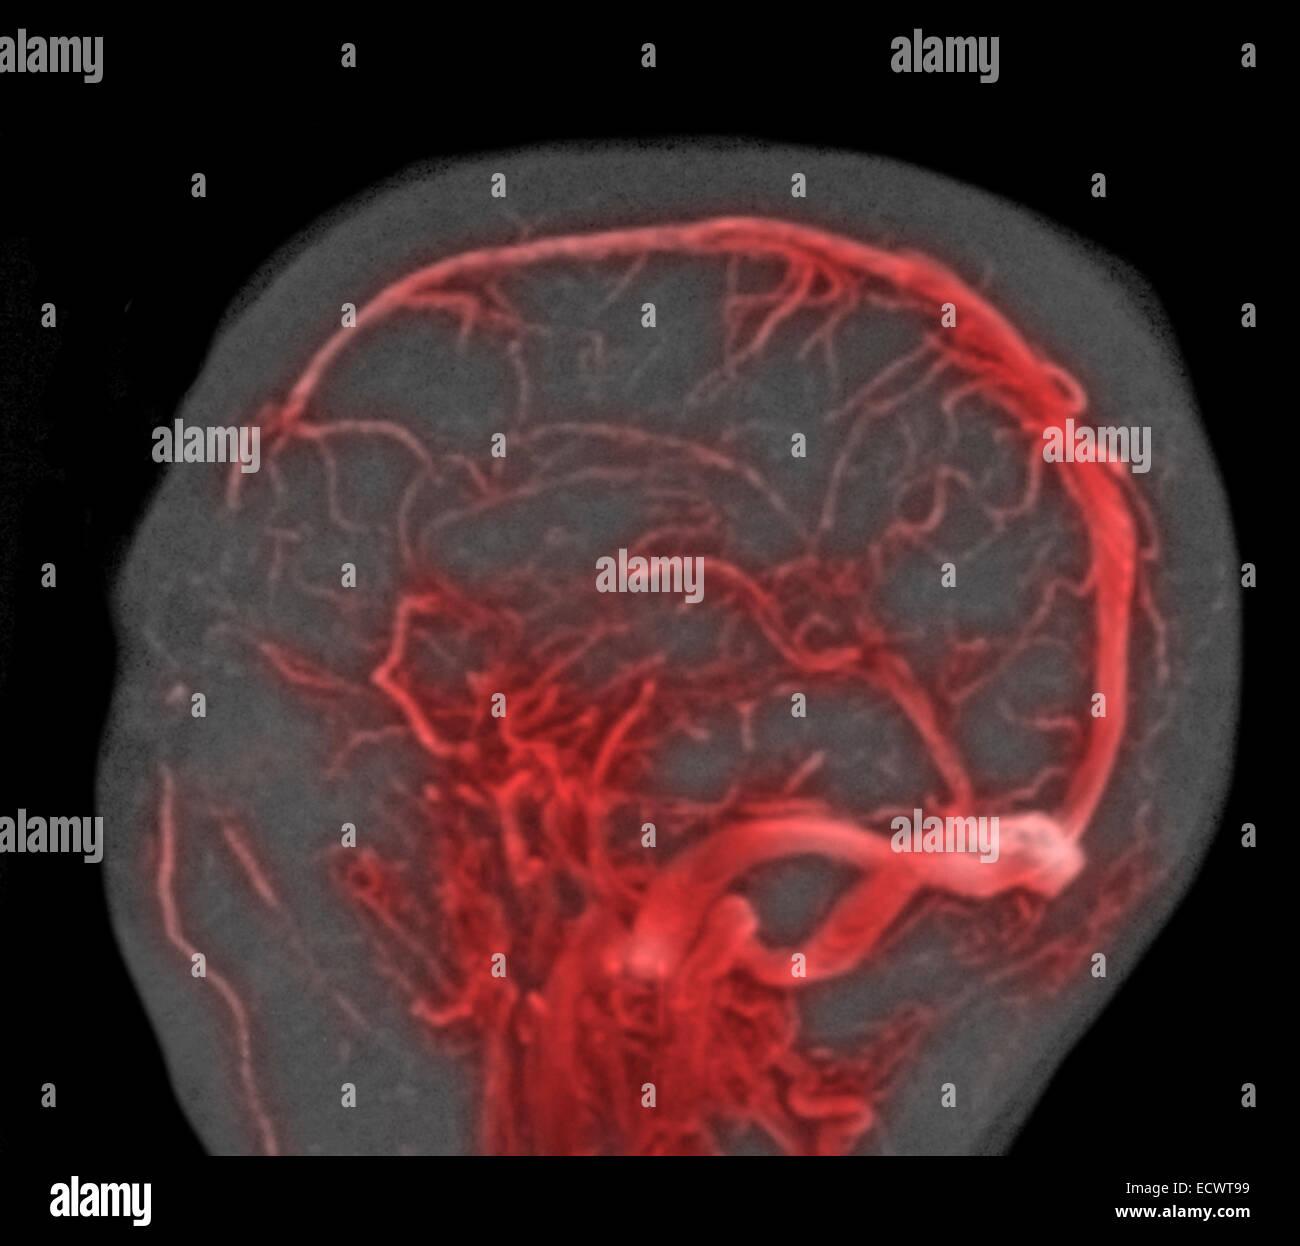 Normal MRI study of the brain. - Stock Image